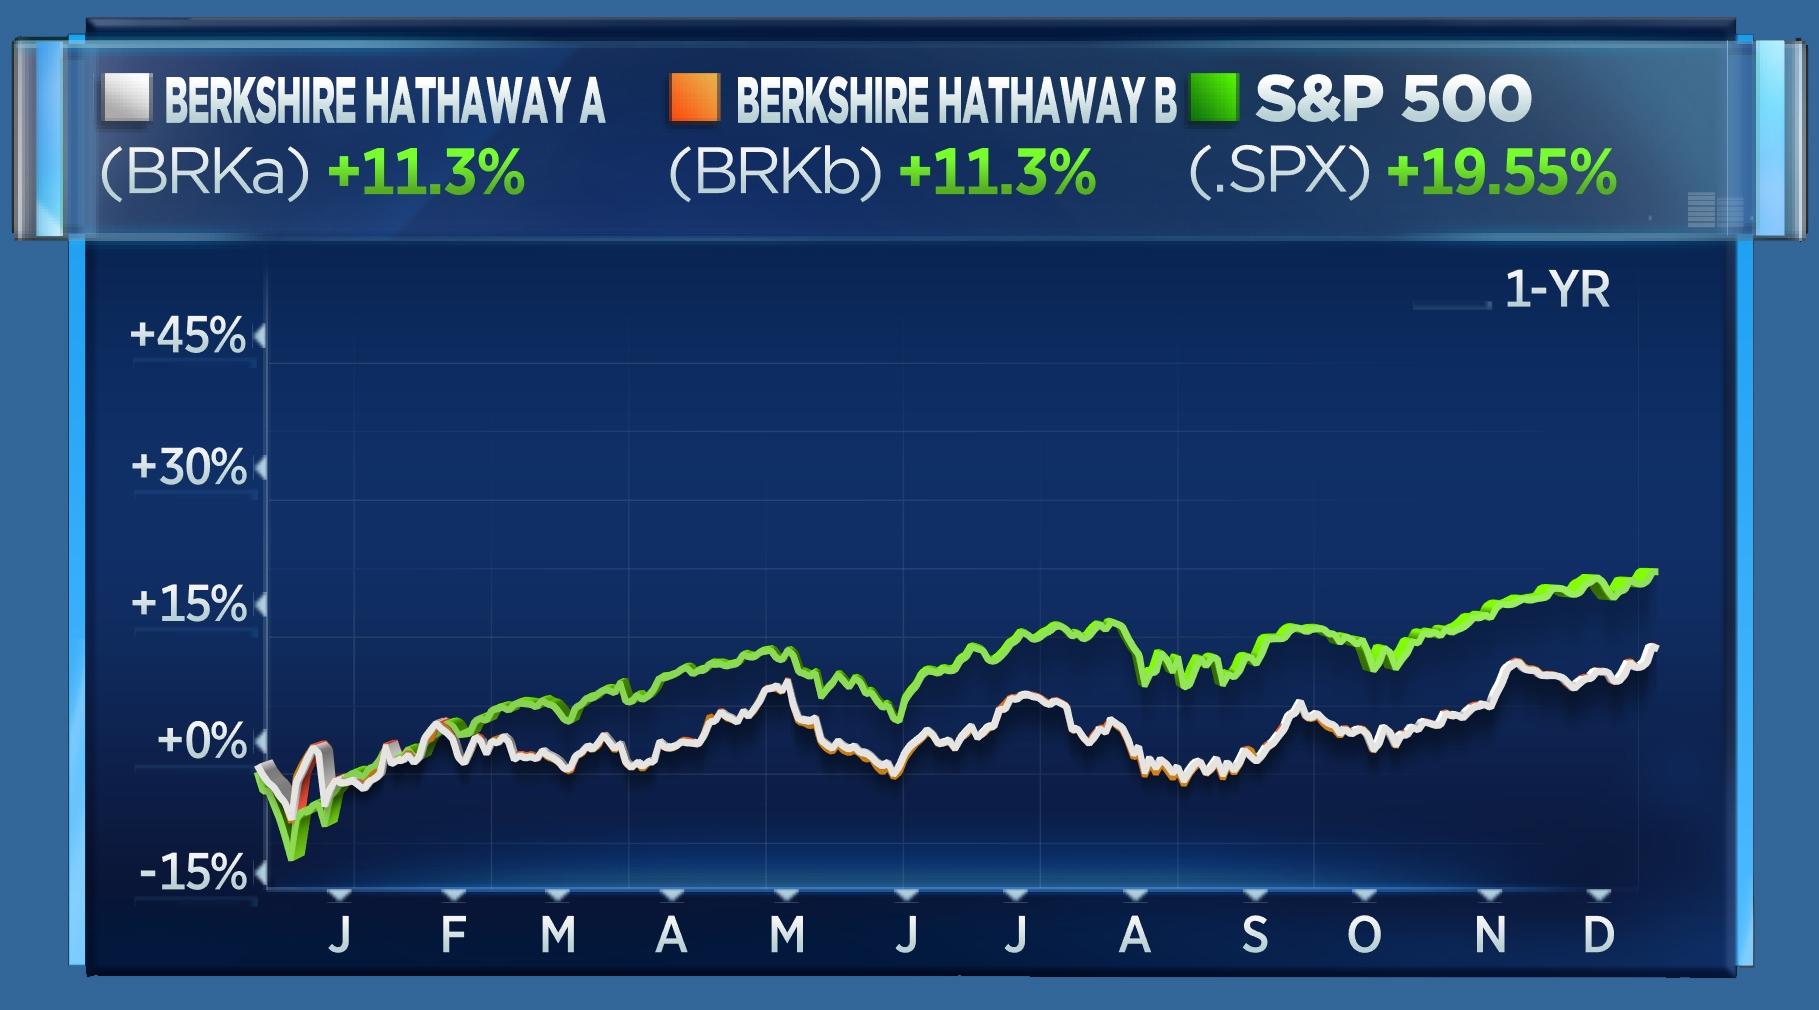 BRK vs S&P